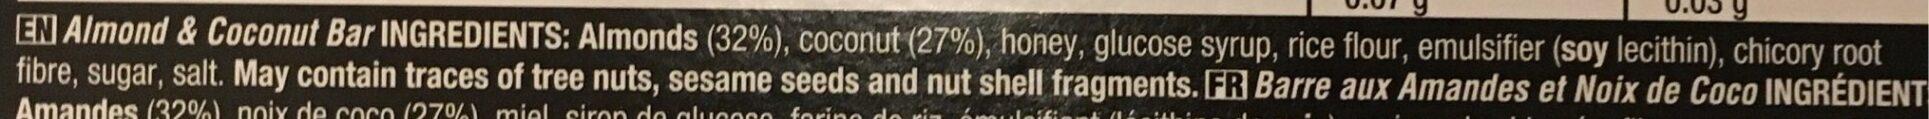 Almond & Coconut Fruit & Nut Bar - Nutrition facts - en